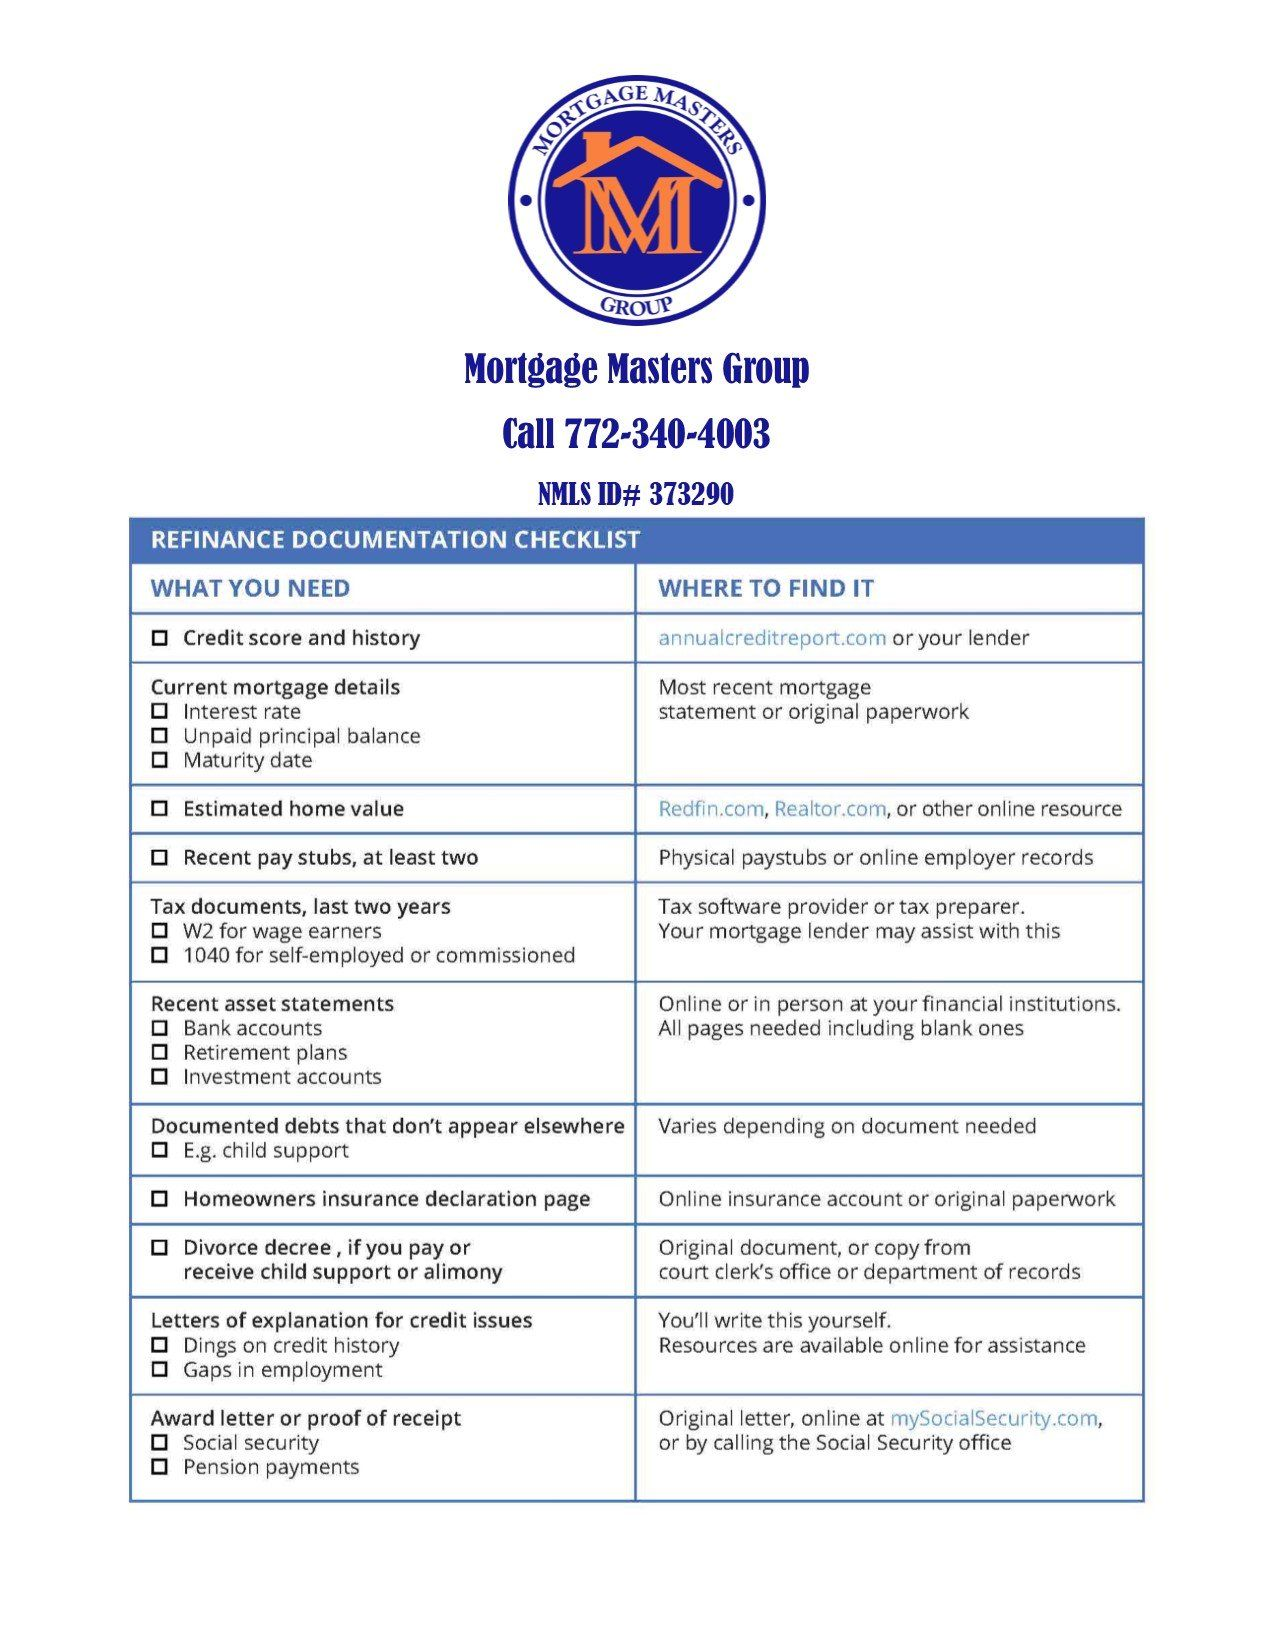 Refinance Checklist Mortgage Interest Rates Credit Score